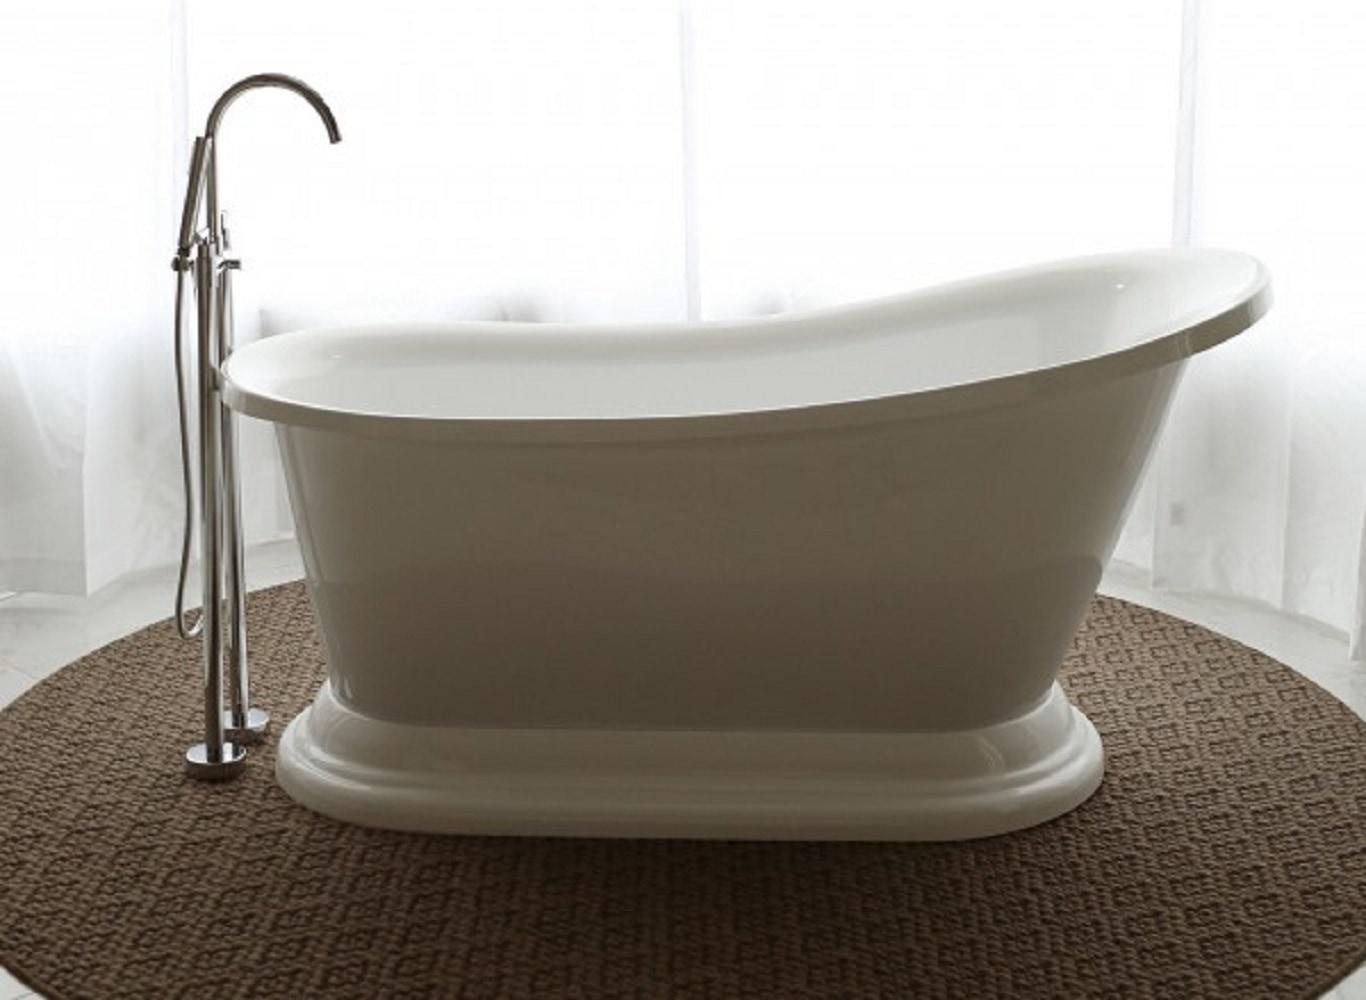 Freestanding tubs / 70x31.5x25 / Acrylic / LPIOAS-FS Signature Bath/Freestanding Tubs 0